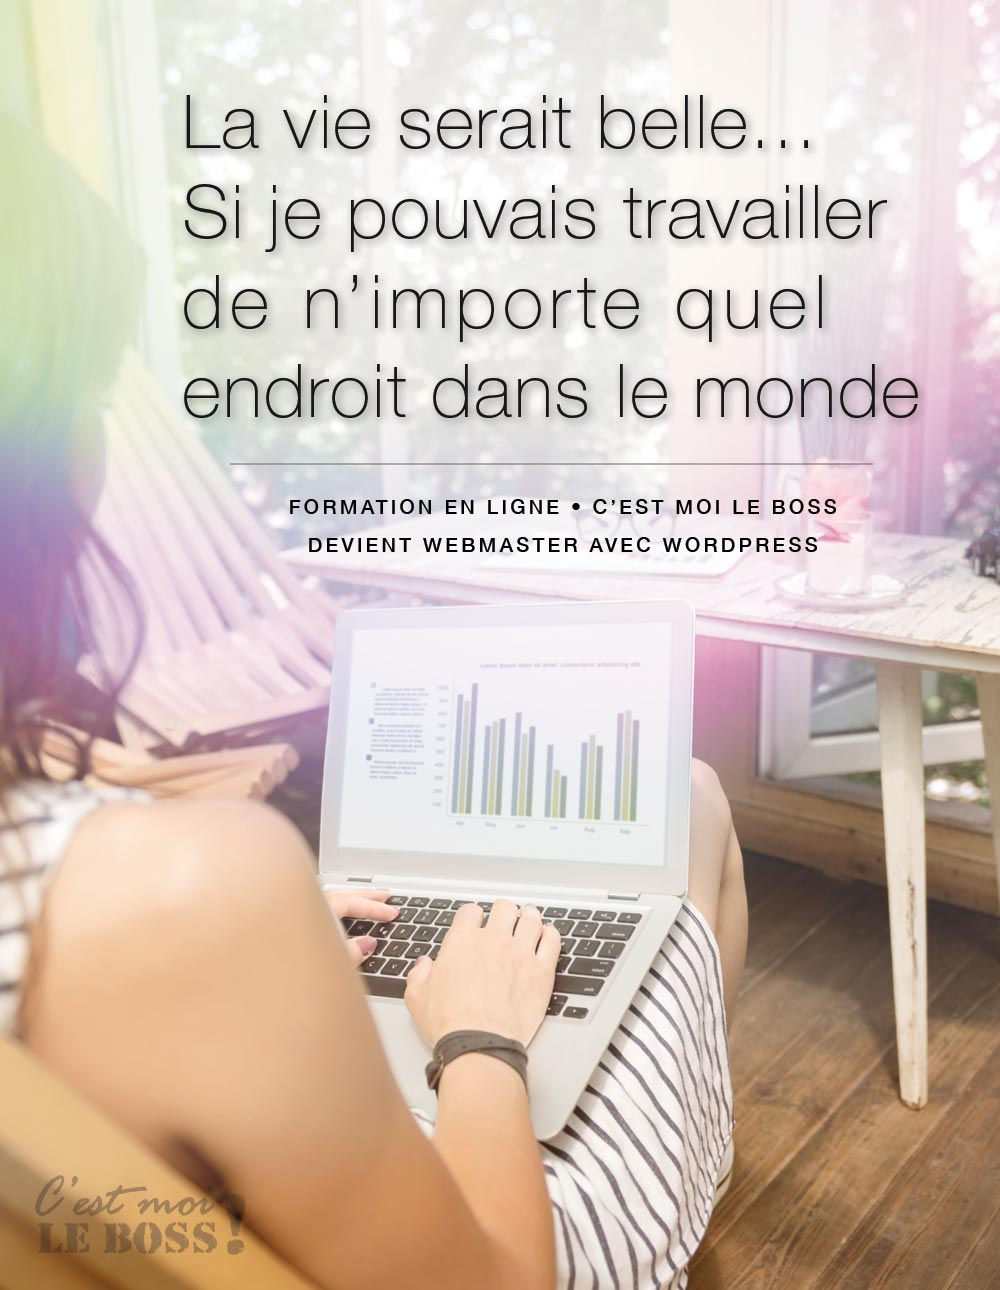 WP Tuto - Monde